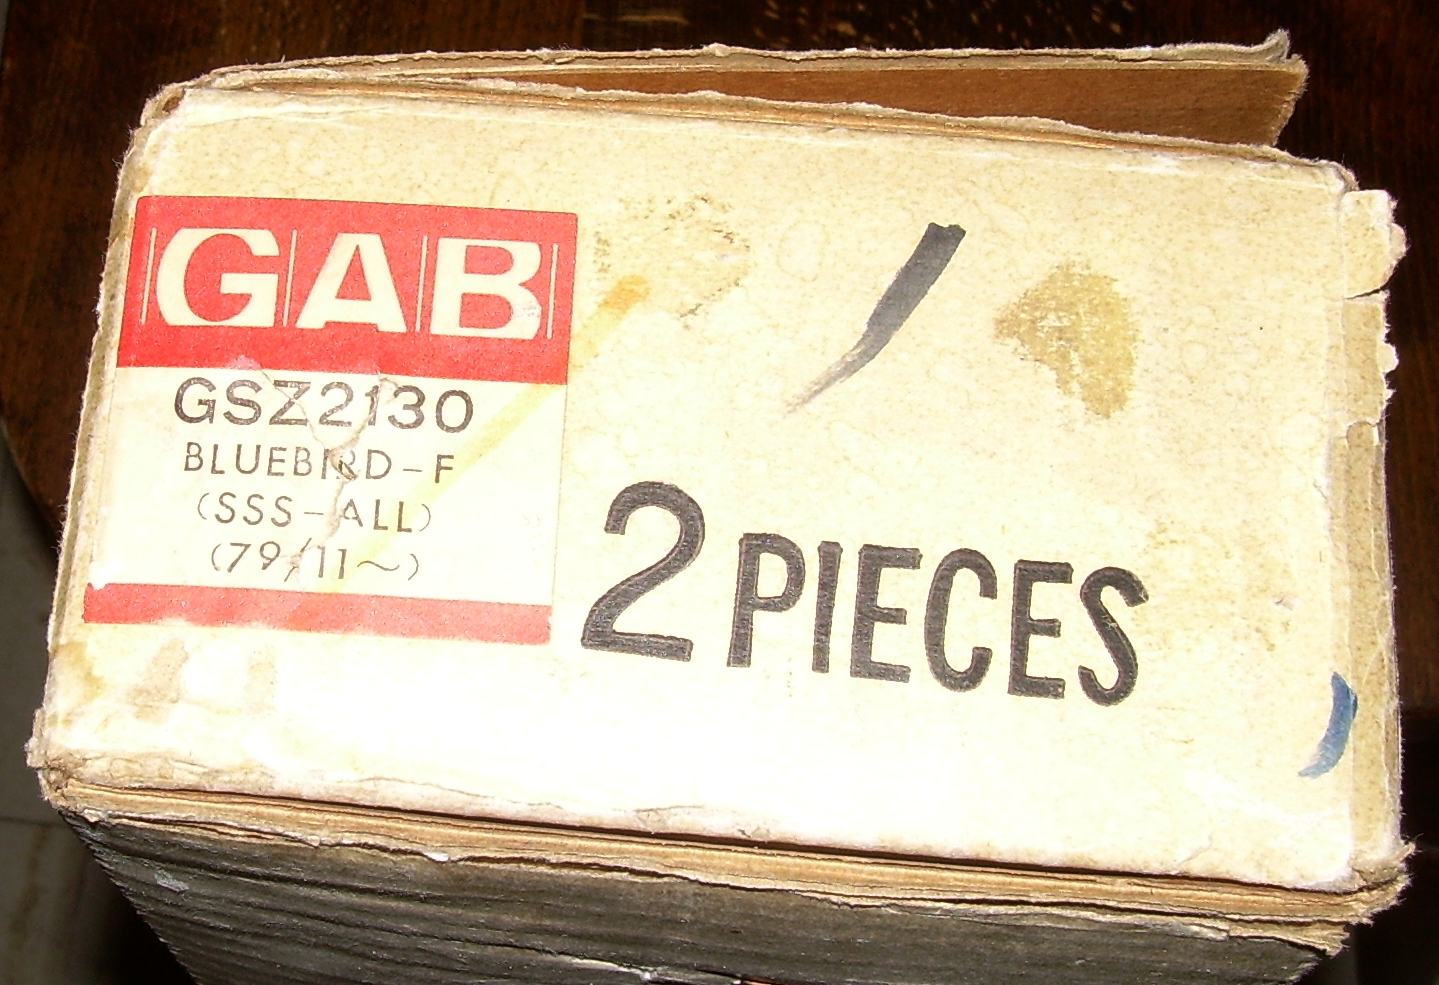 GAB Strut Inserts (1 of 5)